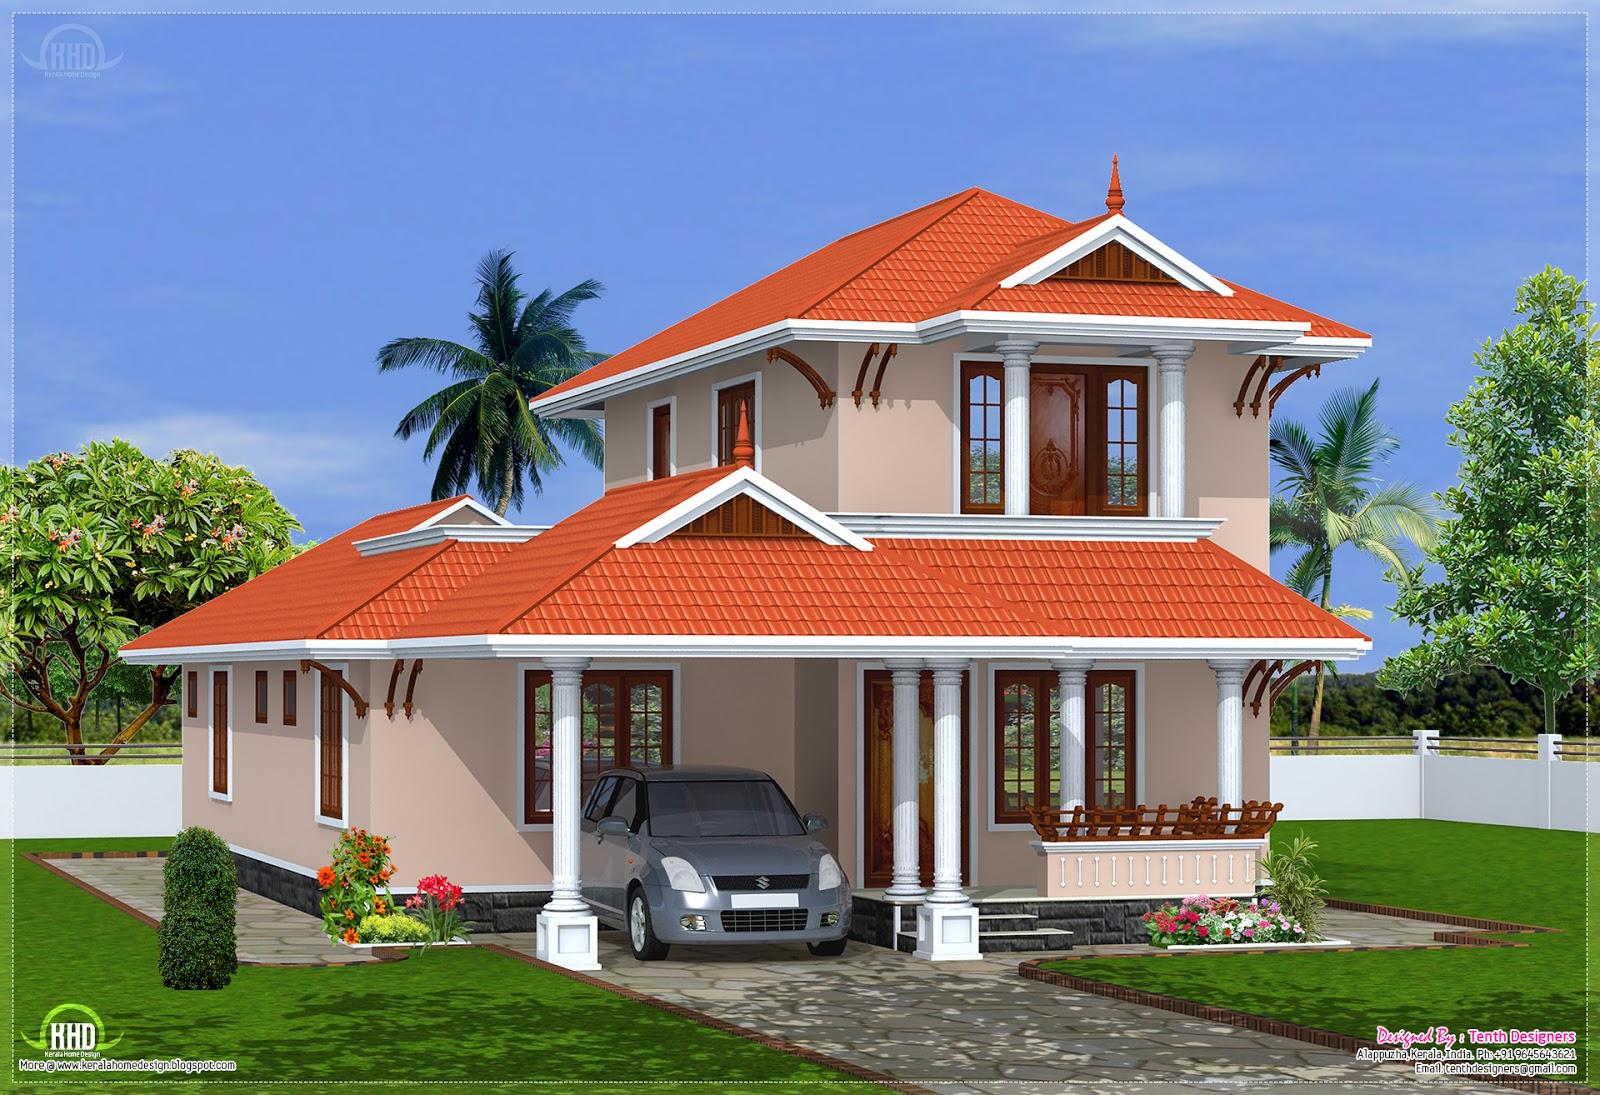 eco friendly houses: 2000 sq.feet Kerala model villa design